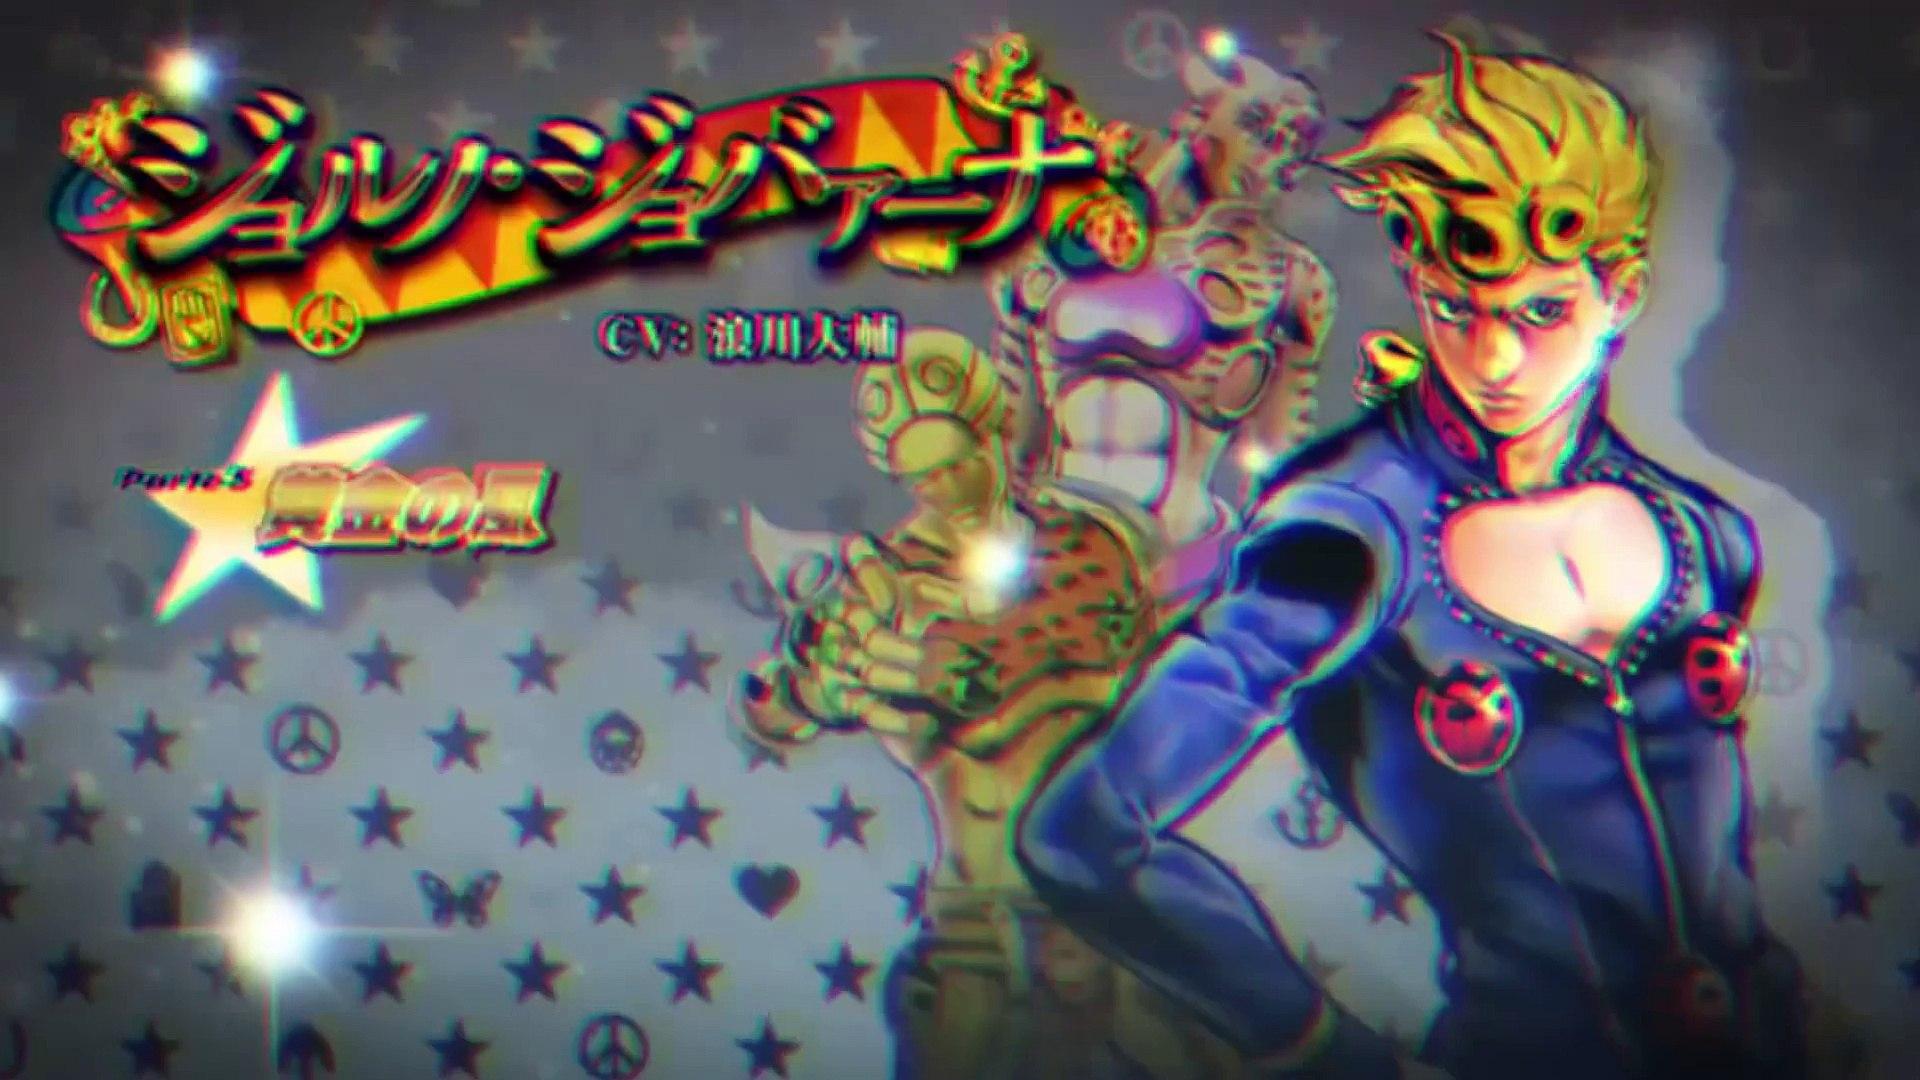 Jojo S Bizarre Adventure Eyes Of Heaven Giorno Giovanni Gameplay Video Dailymotion